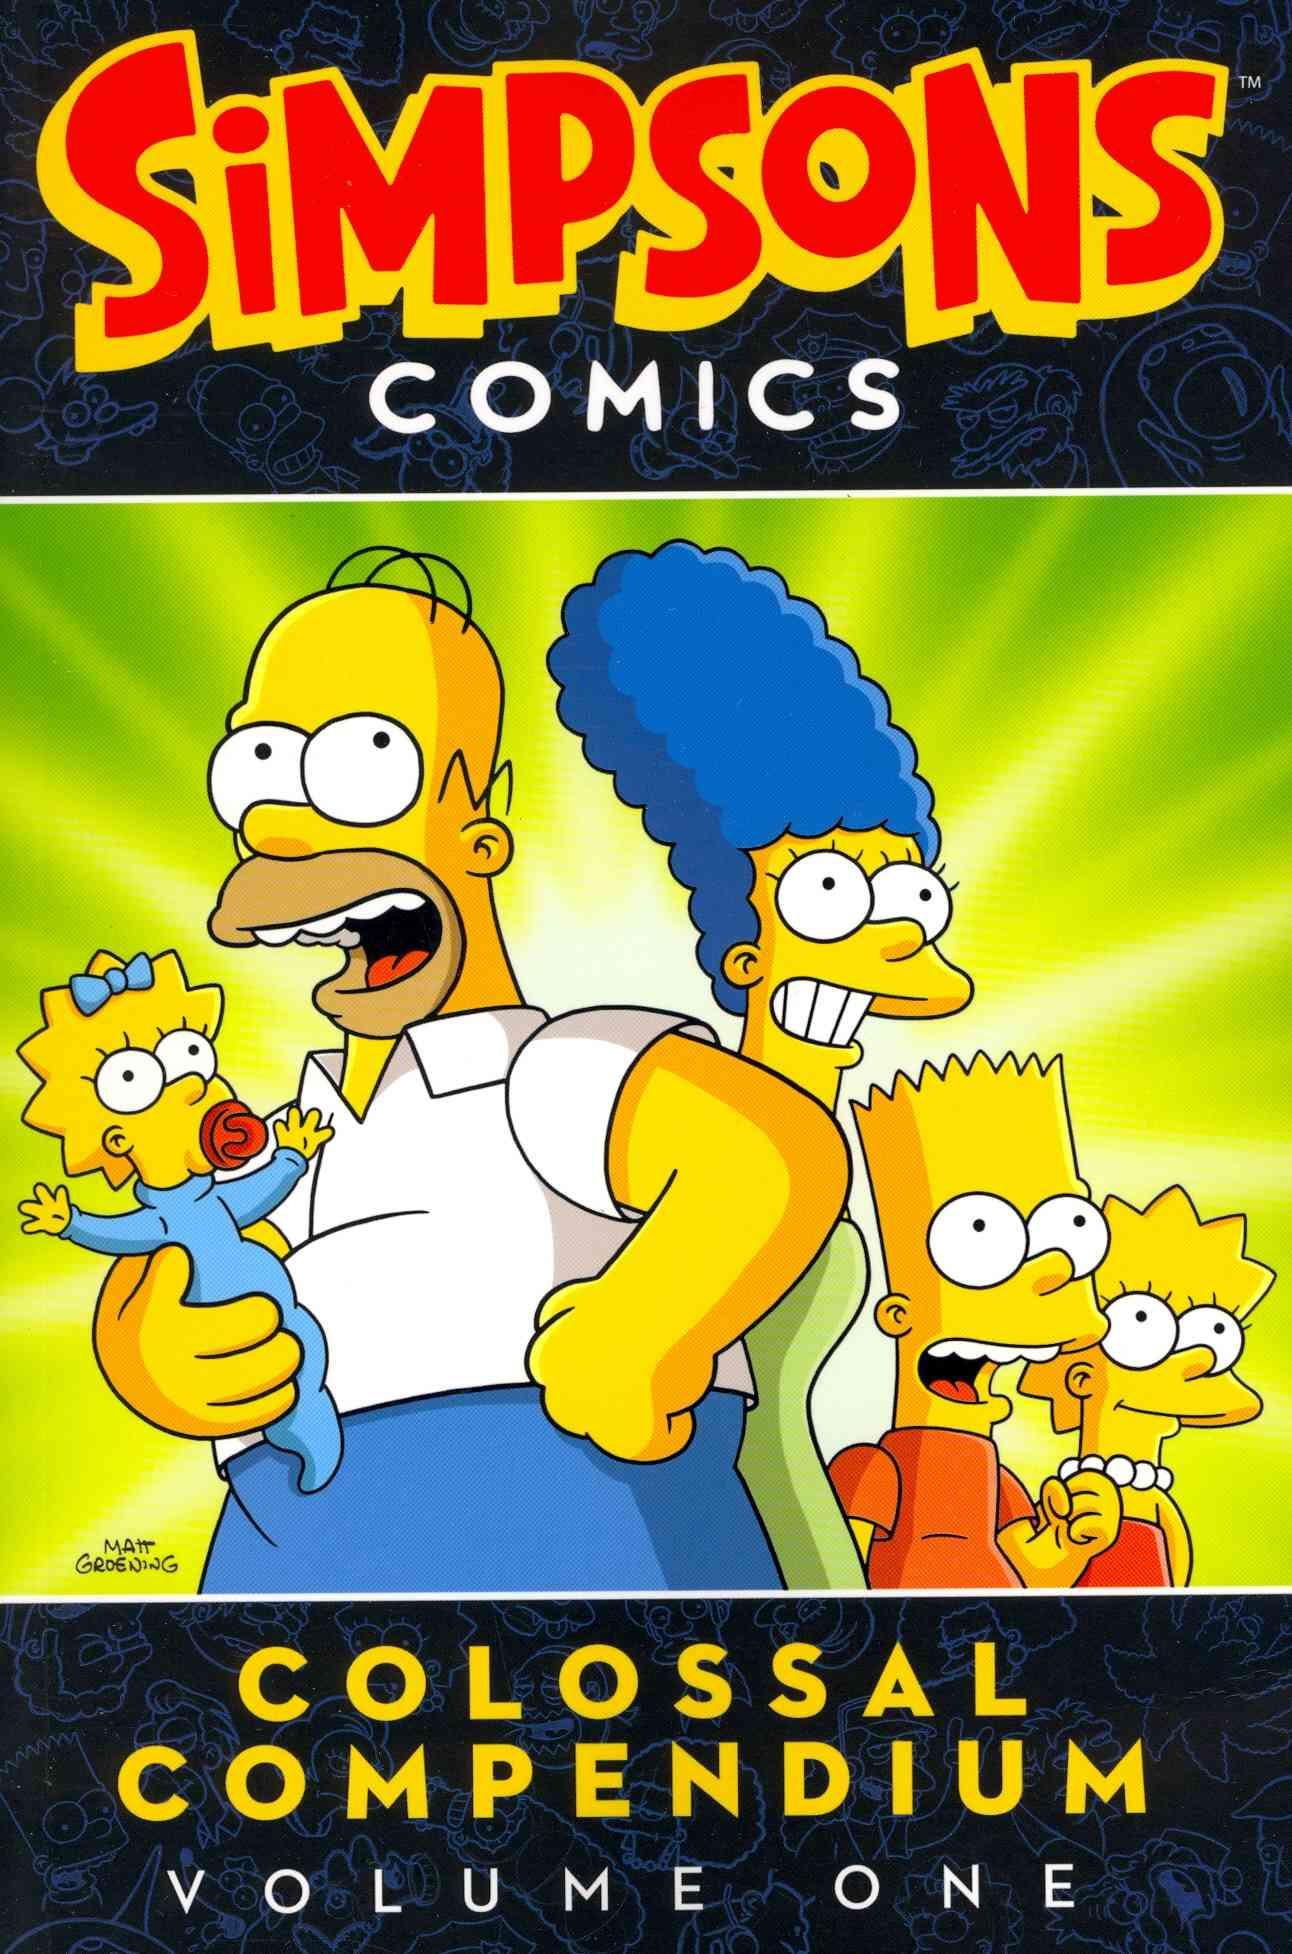 Simpsons Comics Colossal Compendium 1 By Groening, Matt